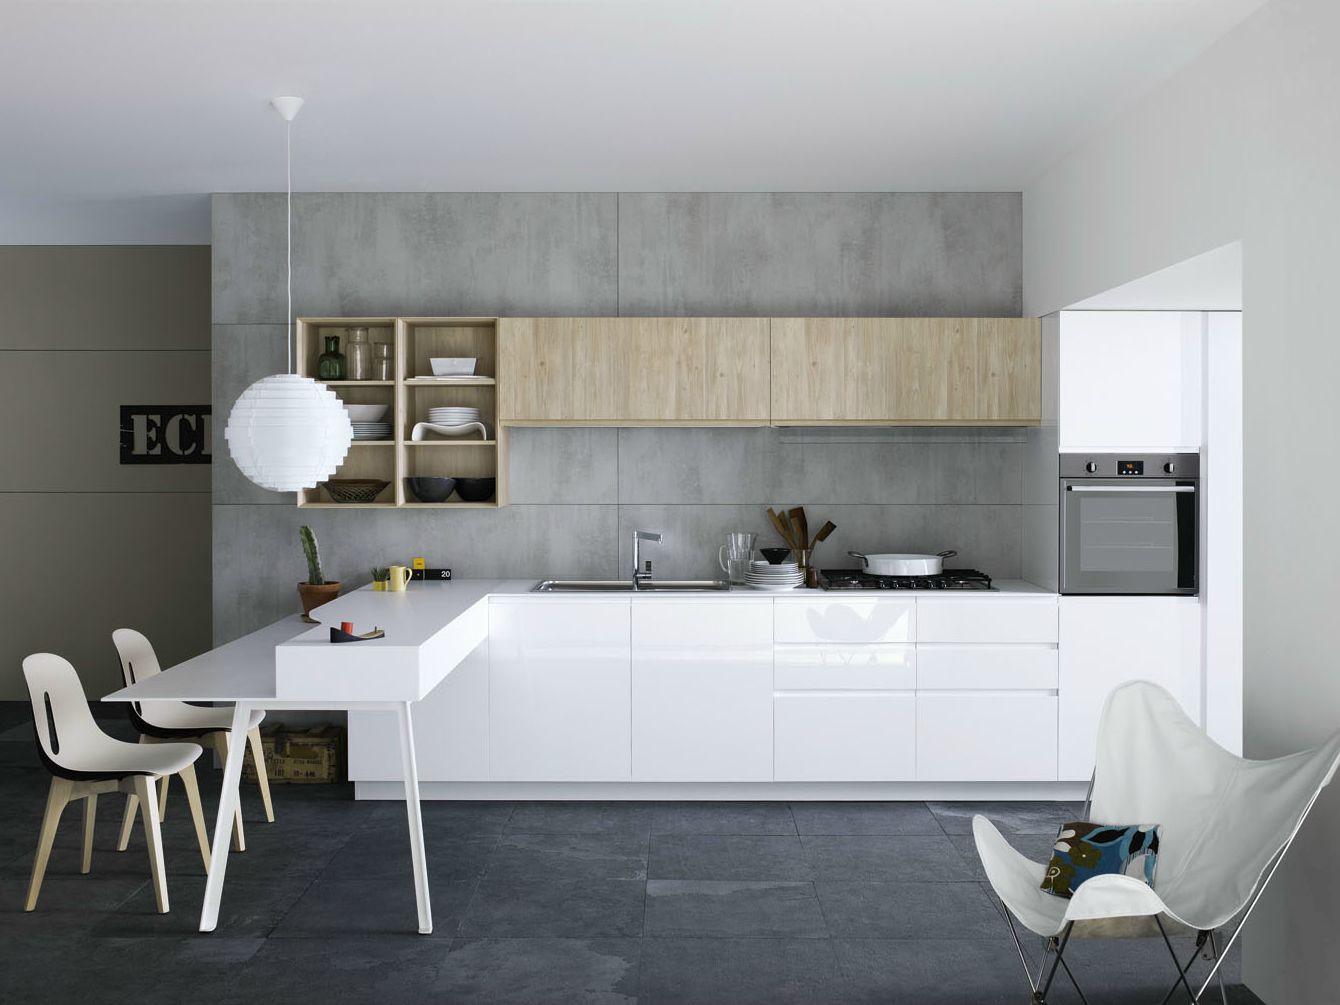 Pin by carol arcenegui on the kitchen pinterest kitchen design